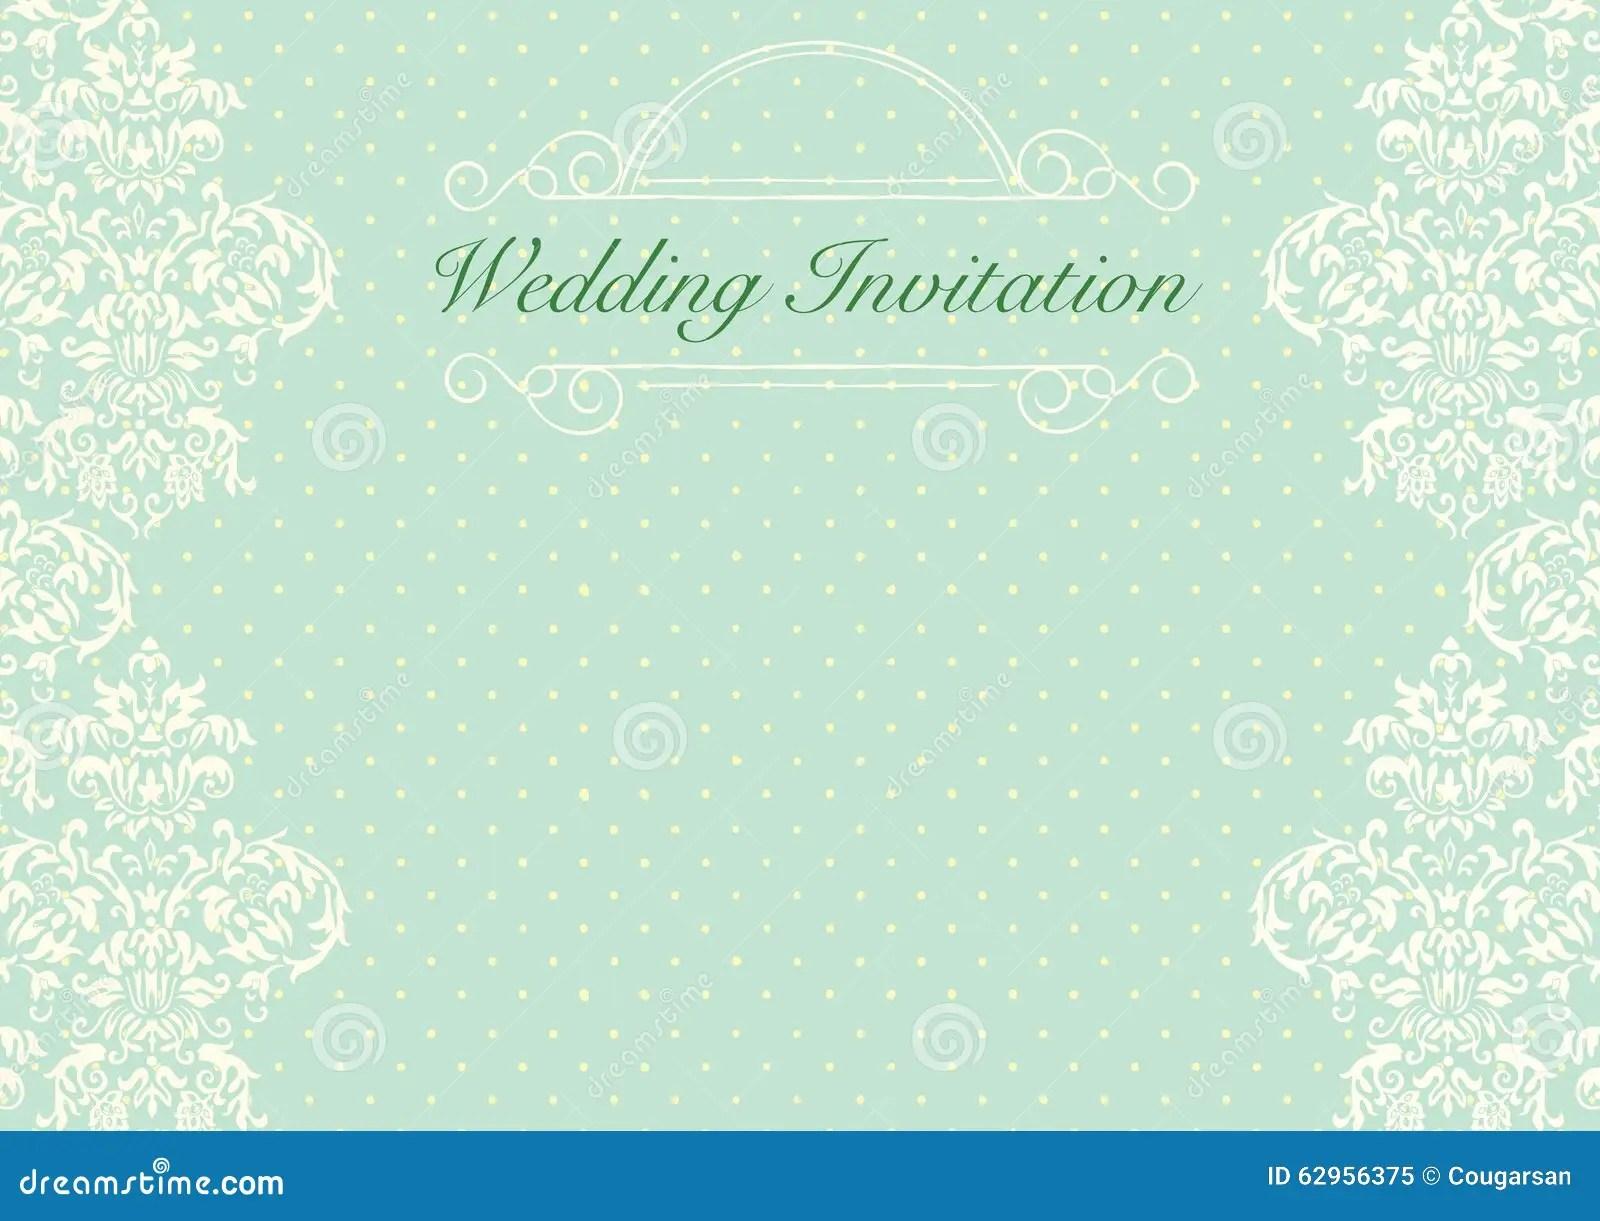 Mint Green Wedding Invitation Background Stock